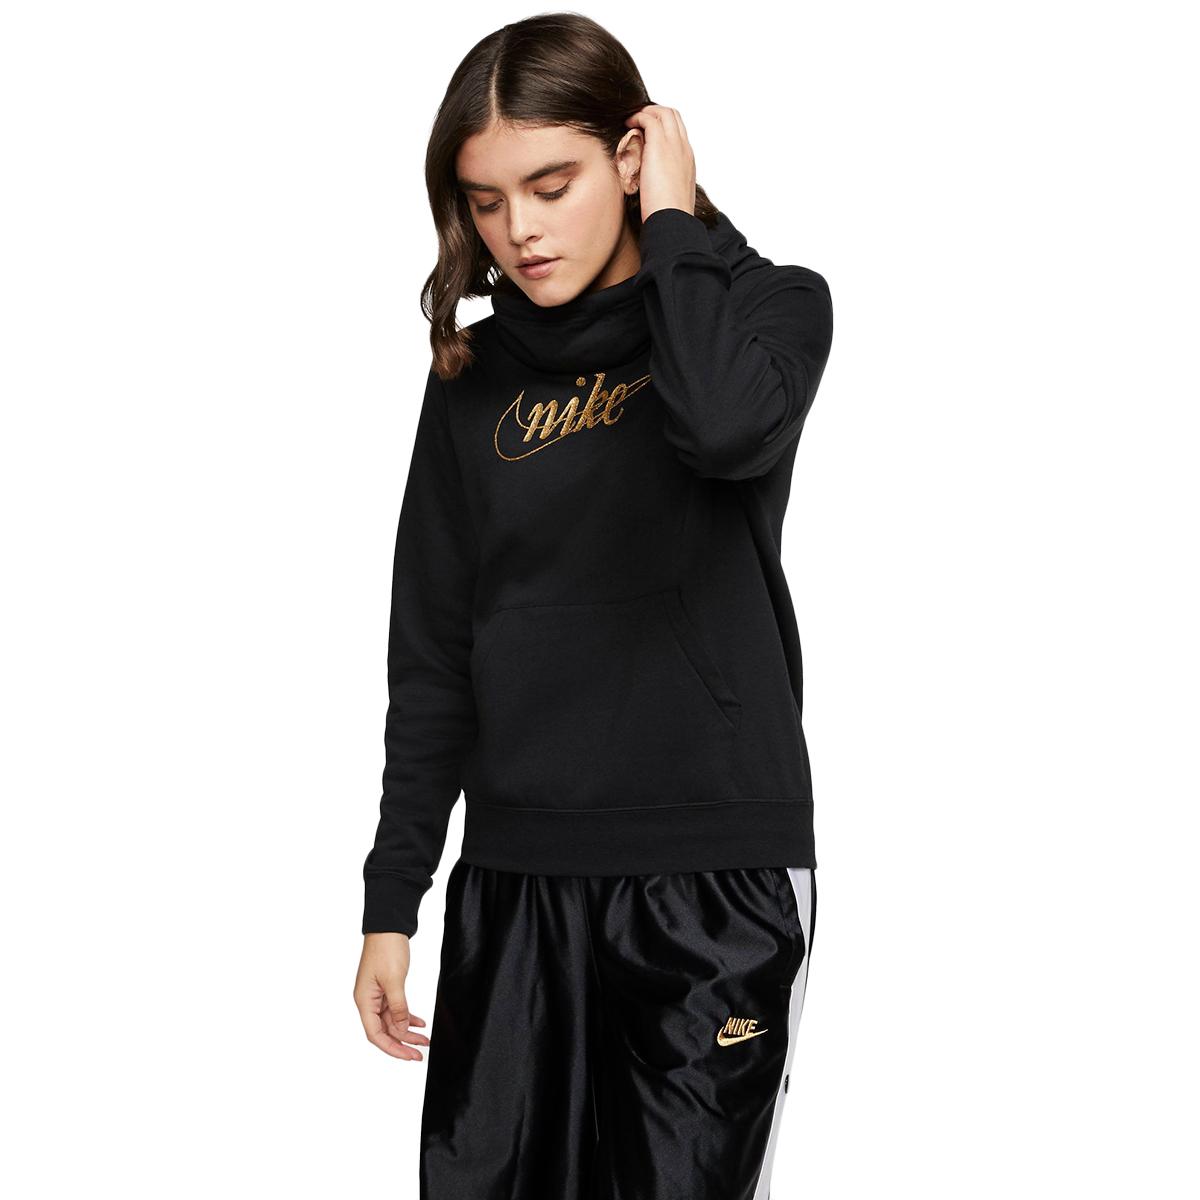 Nike Women's Glitter Logo Pullover Hoodie - Black, M